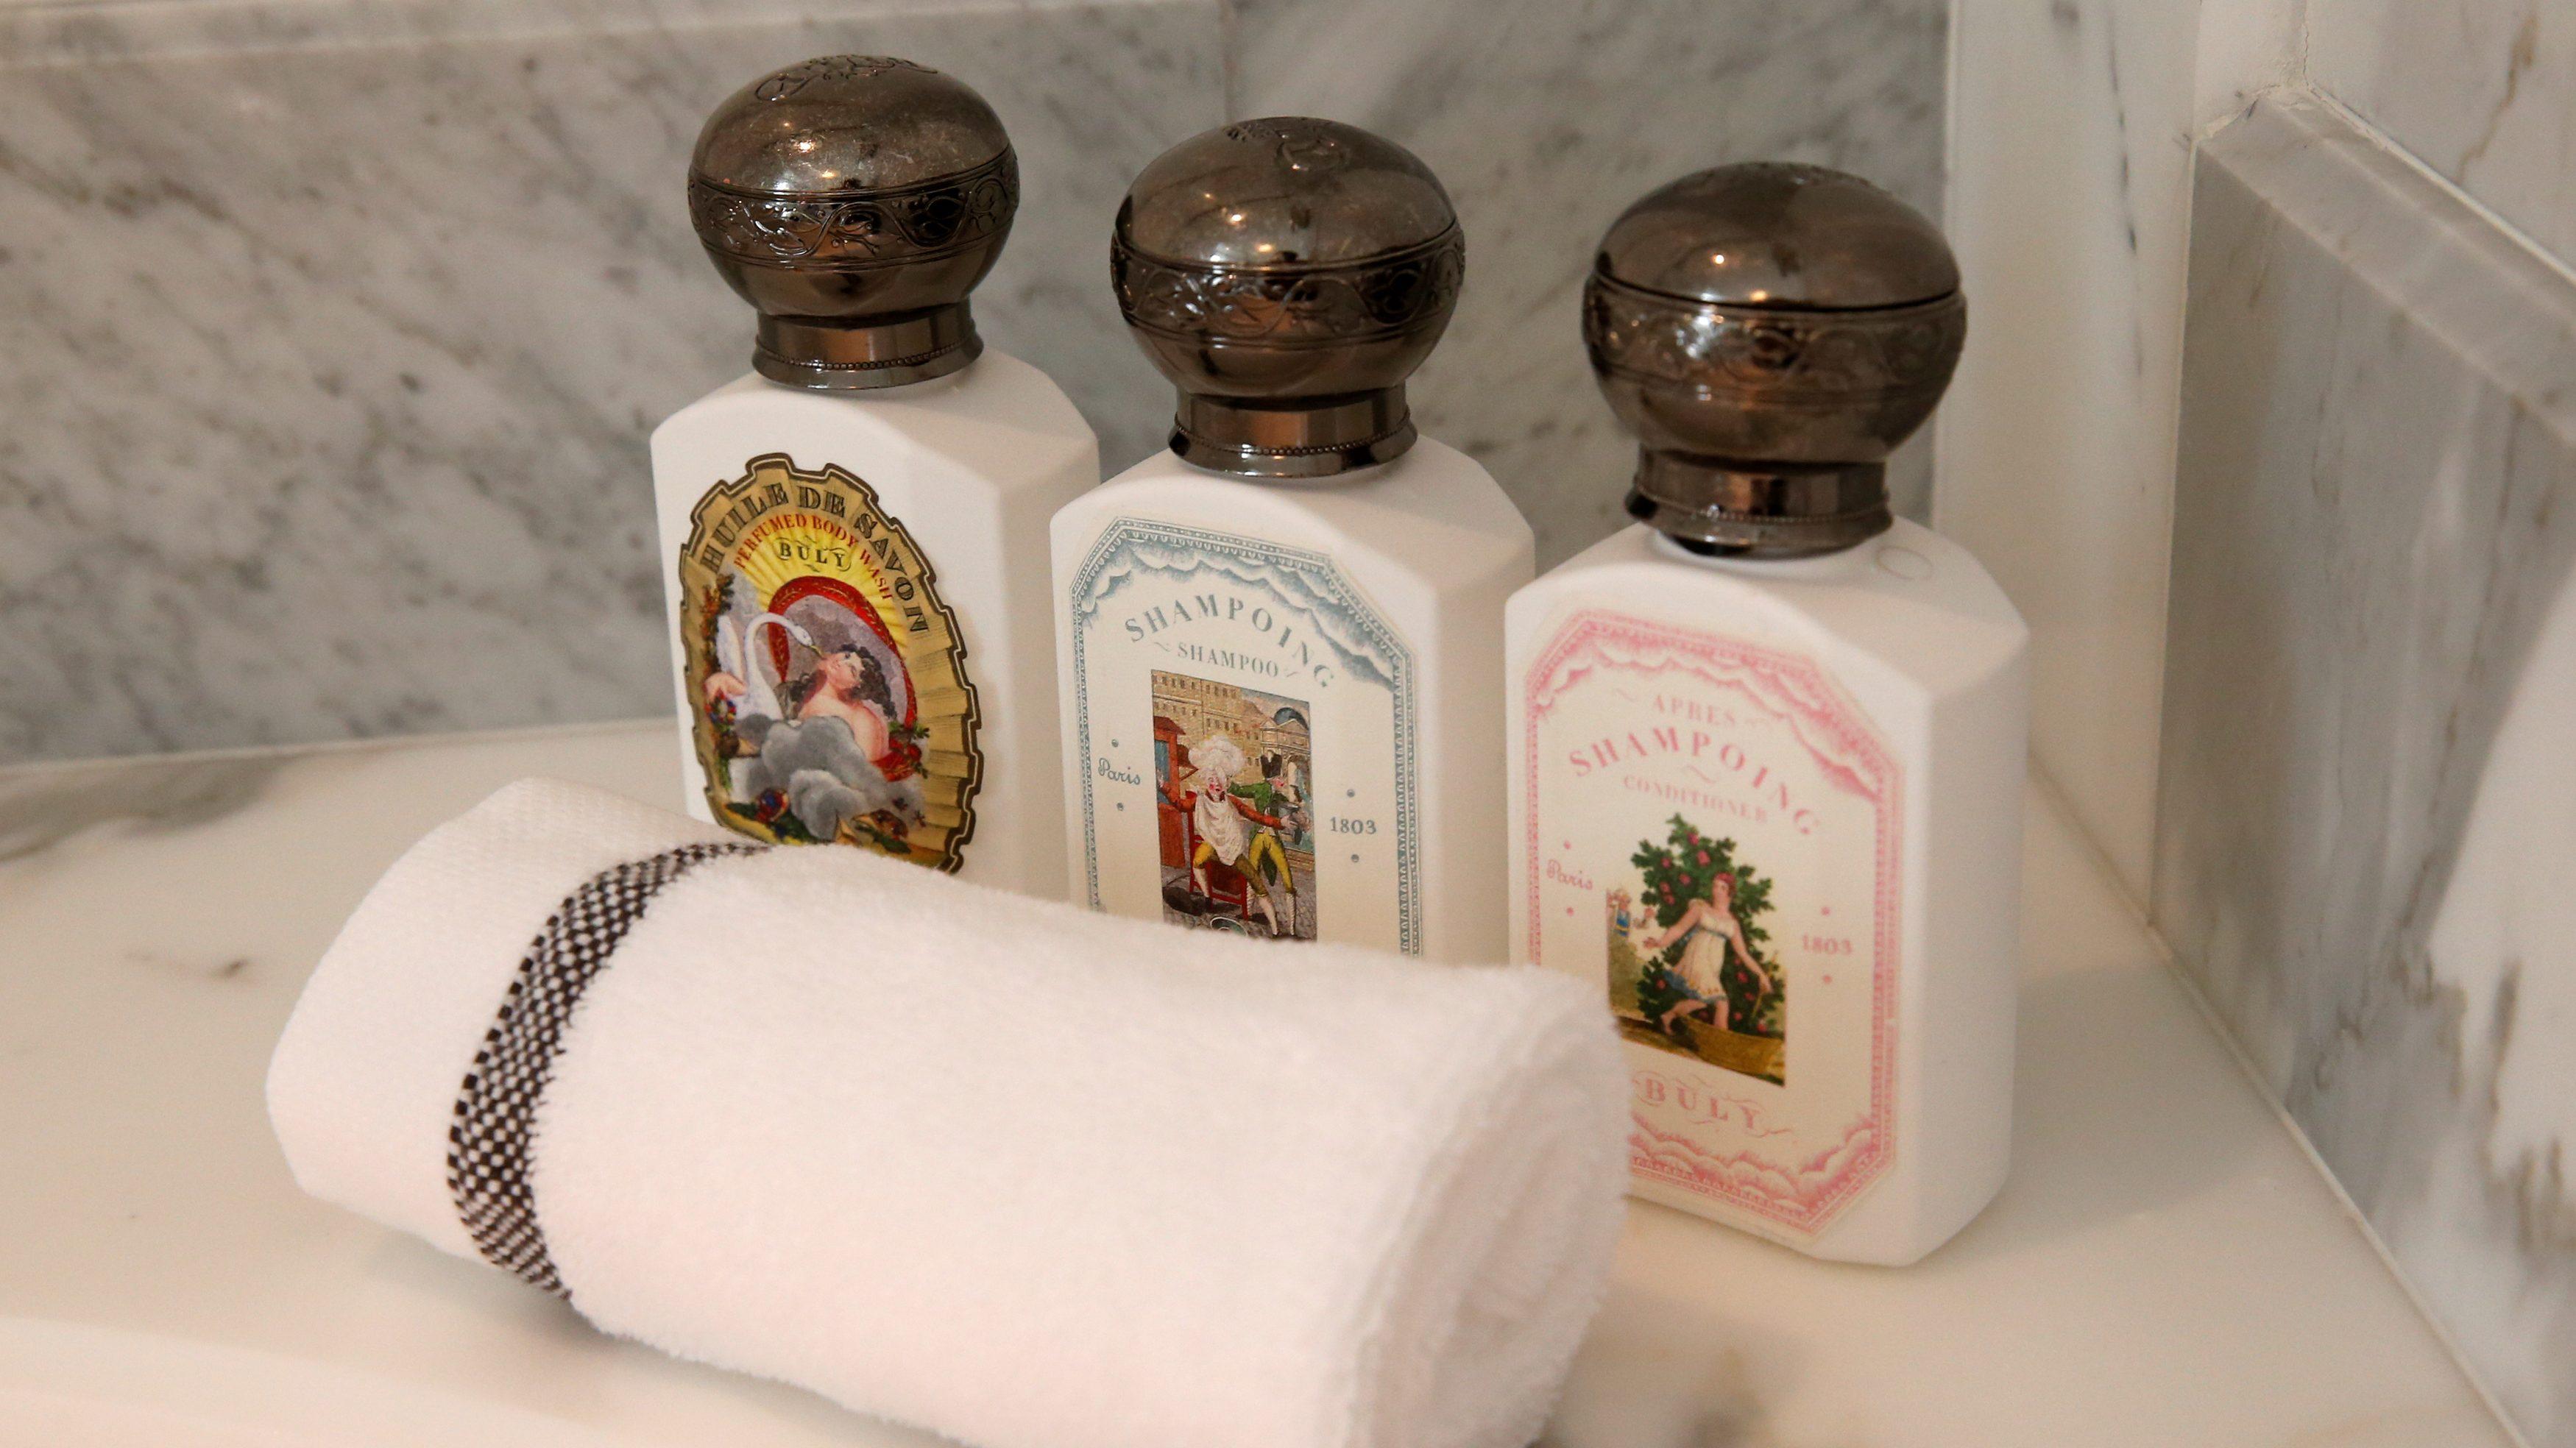 mini-hotel-shampoos